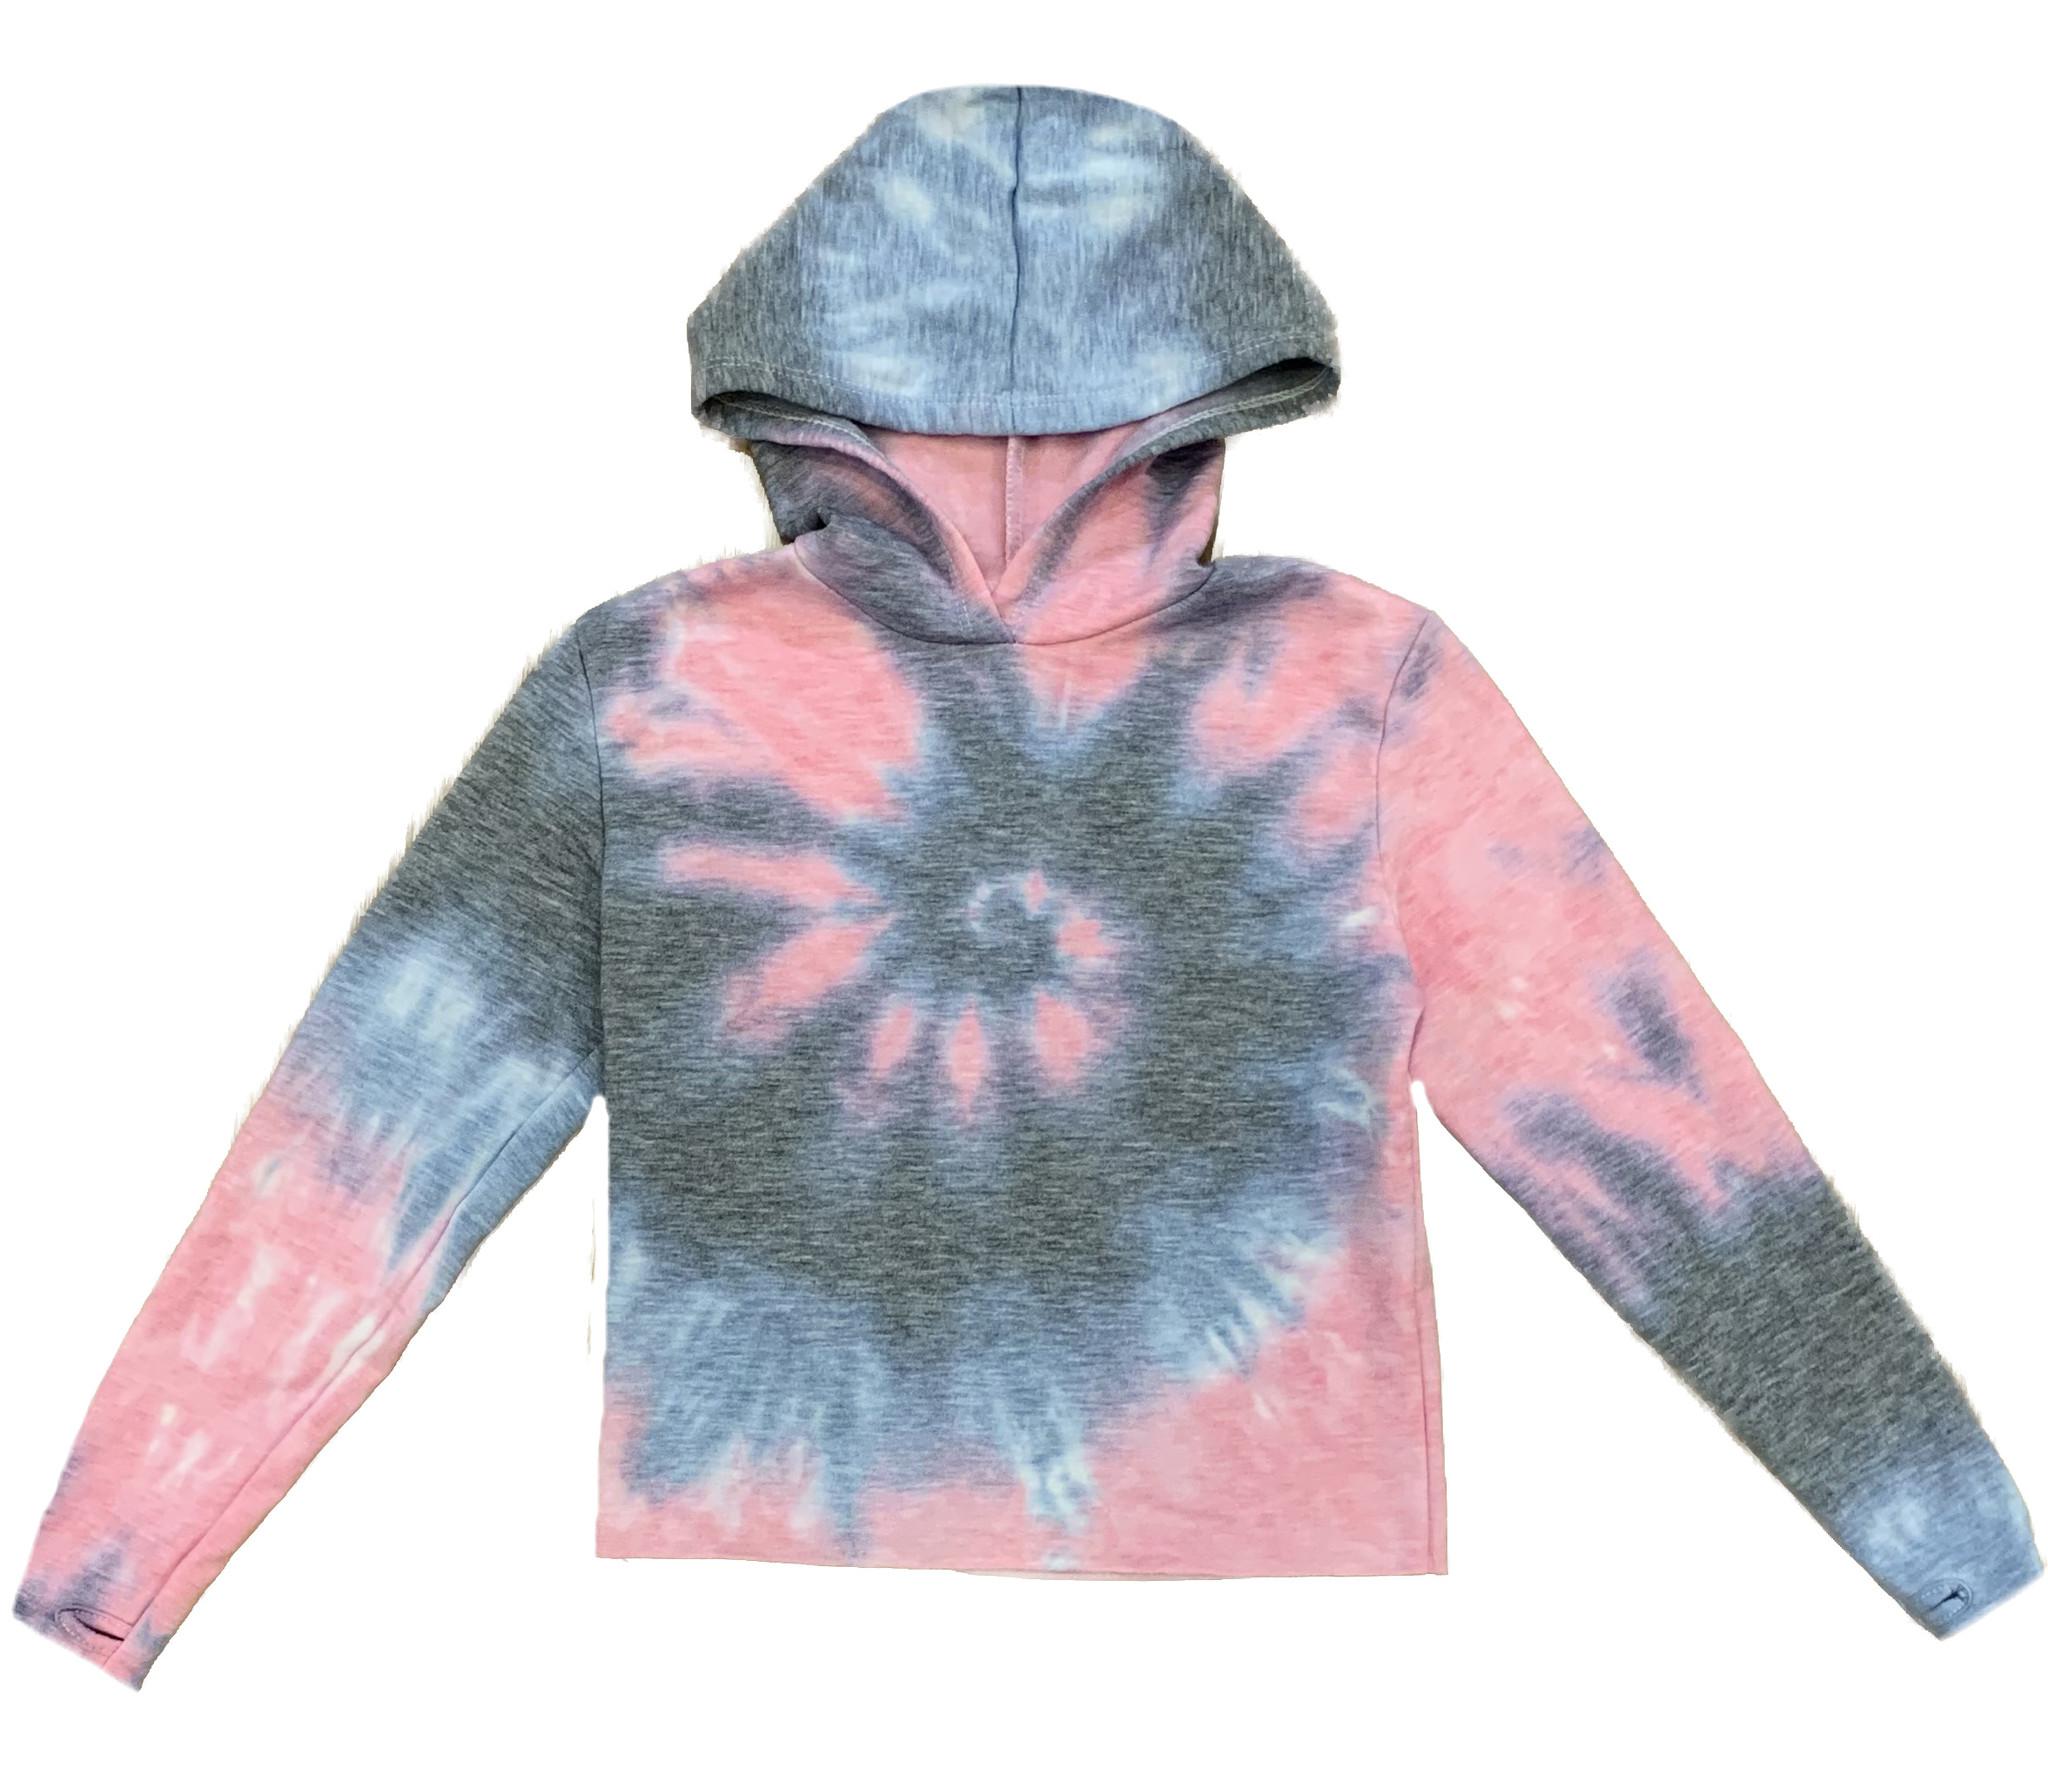 Firehouse Ariana Tie Dye Hooded Crop Sweatshirt